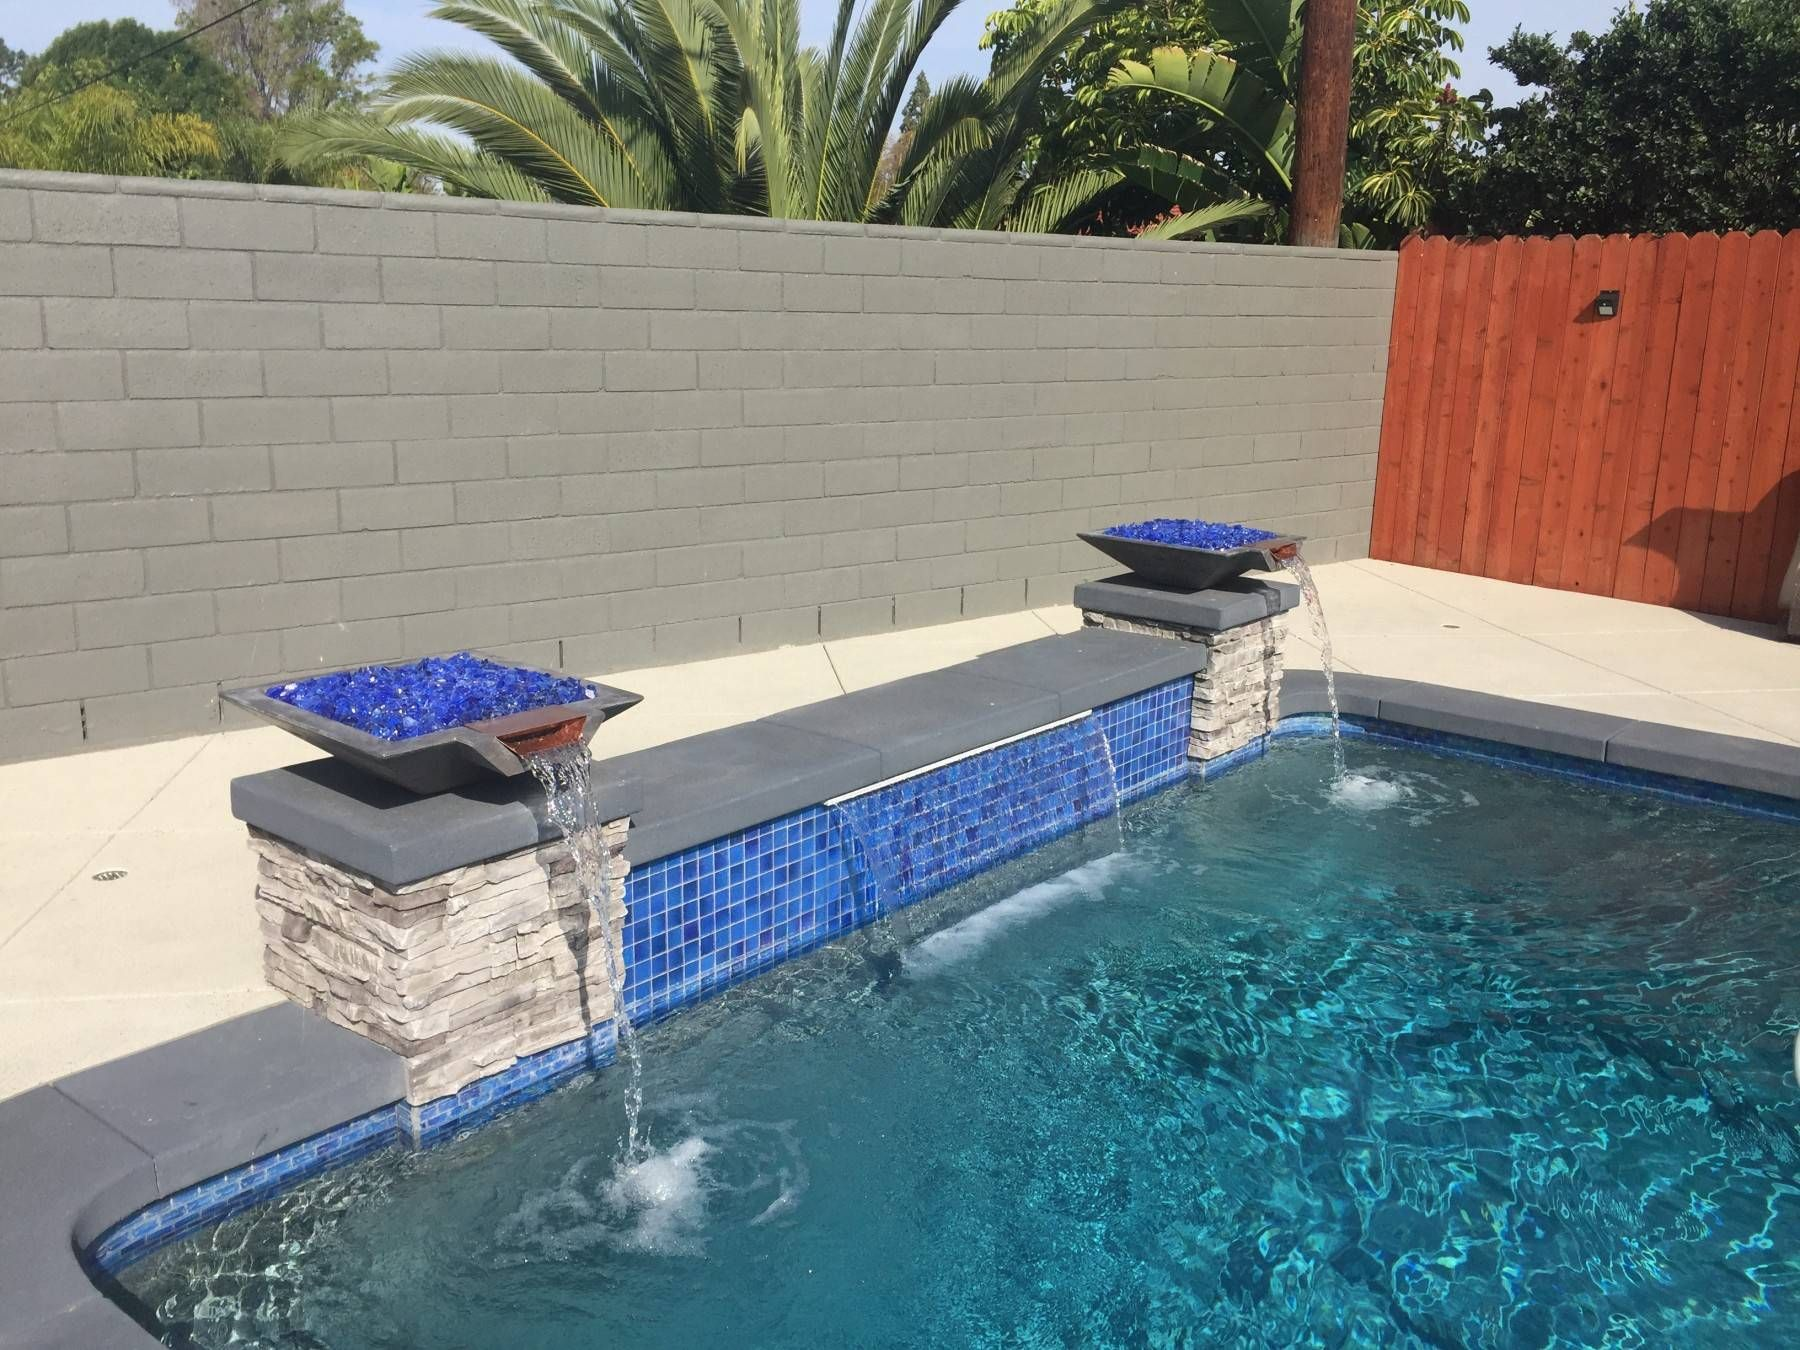 Concrete Pool Fire Bowl Square with Scupper 36\